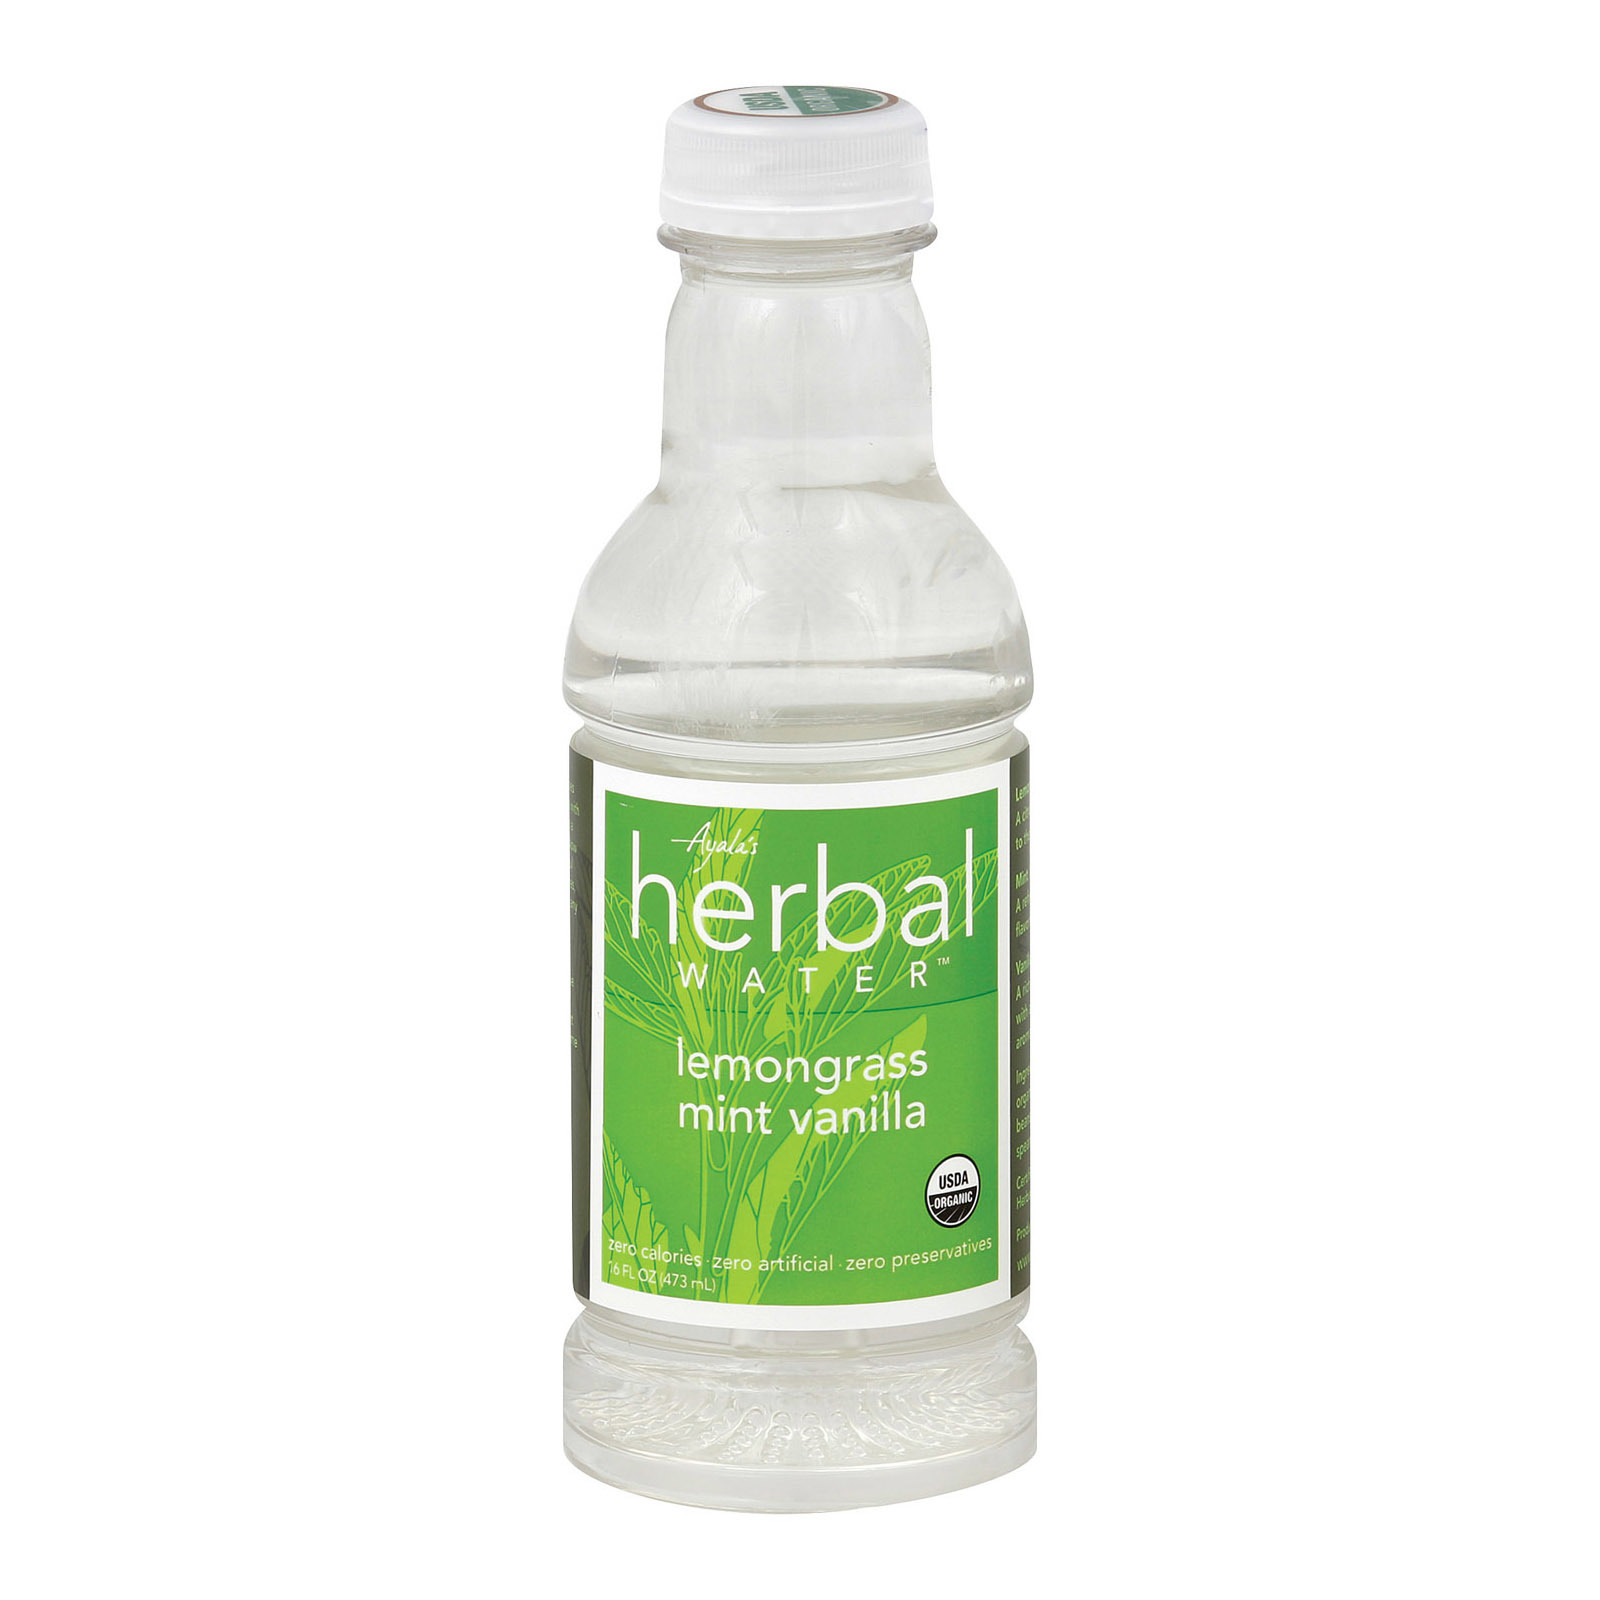 Ayala's Herbal Water - Still Lemongrass Mint Vanilla - Case of 12 - 16 Fl oz.